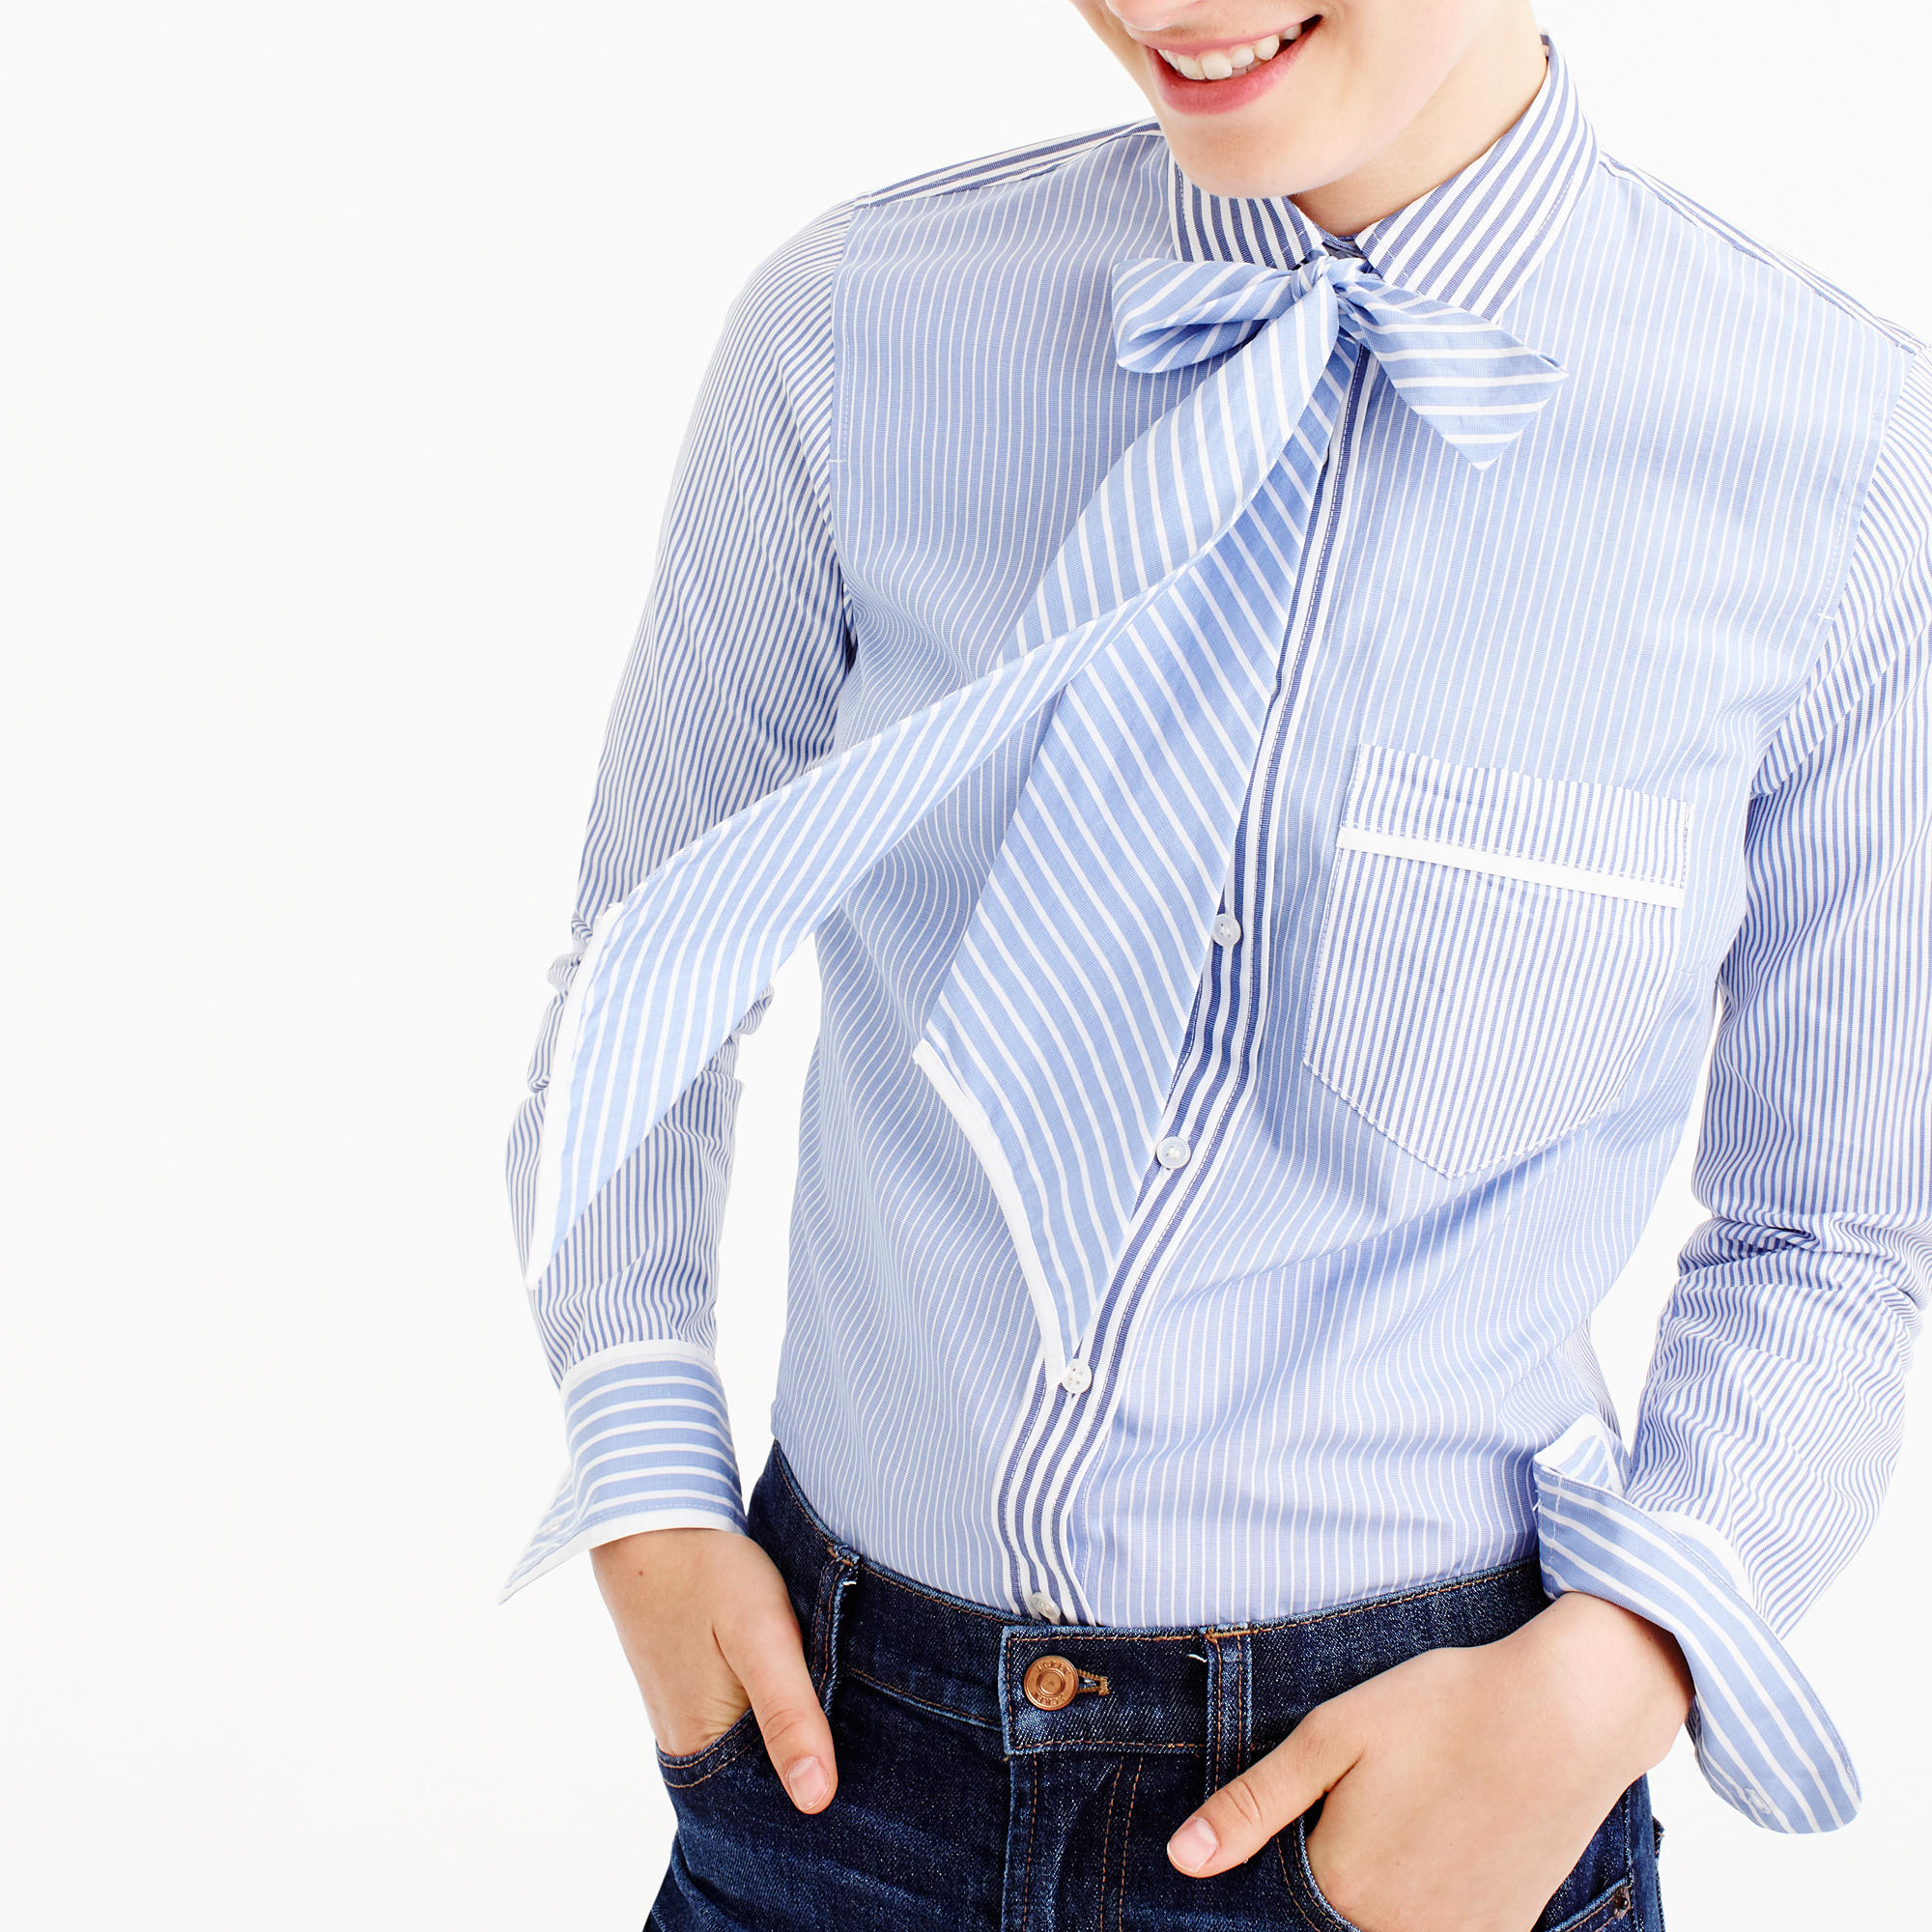 J Crew neck tie cocktail shirt |  | see more on www.shoppingmycloset.com #jcrew